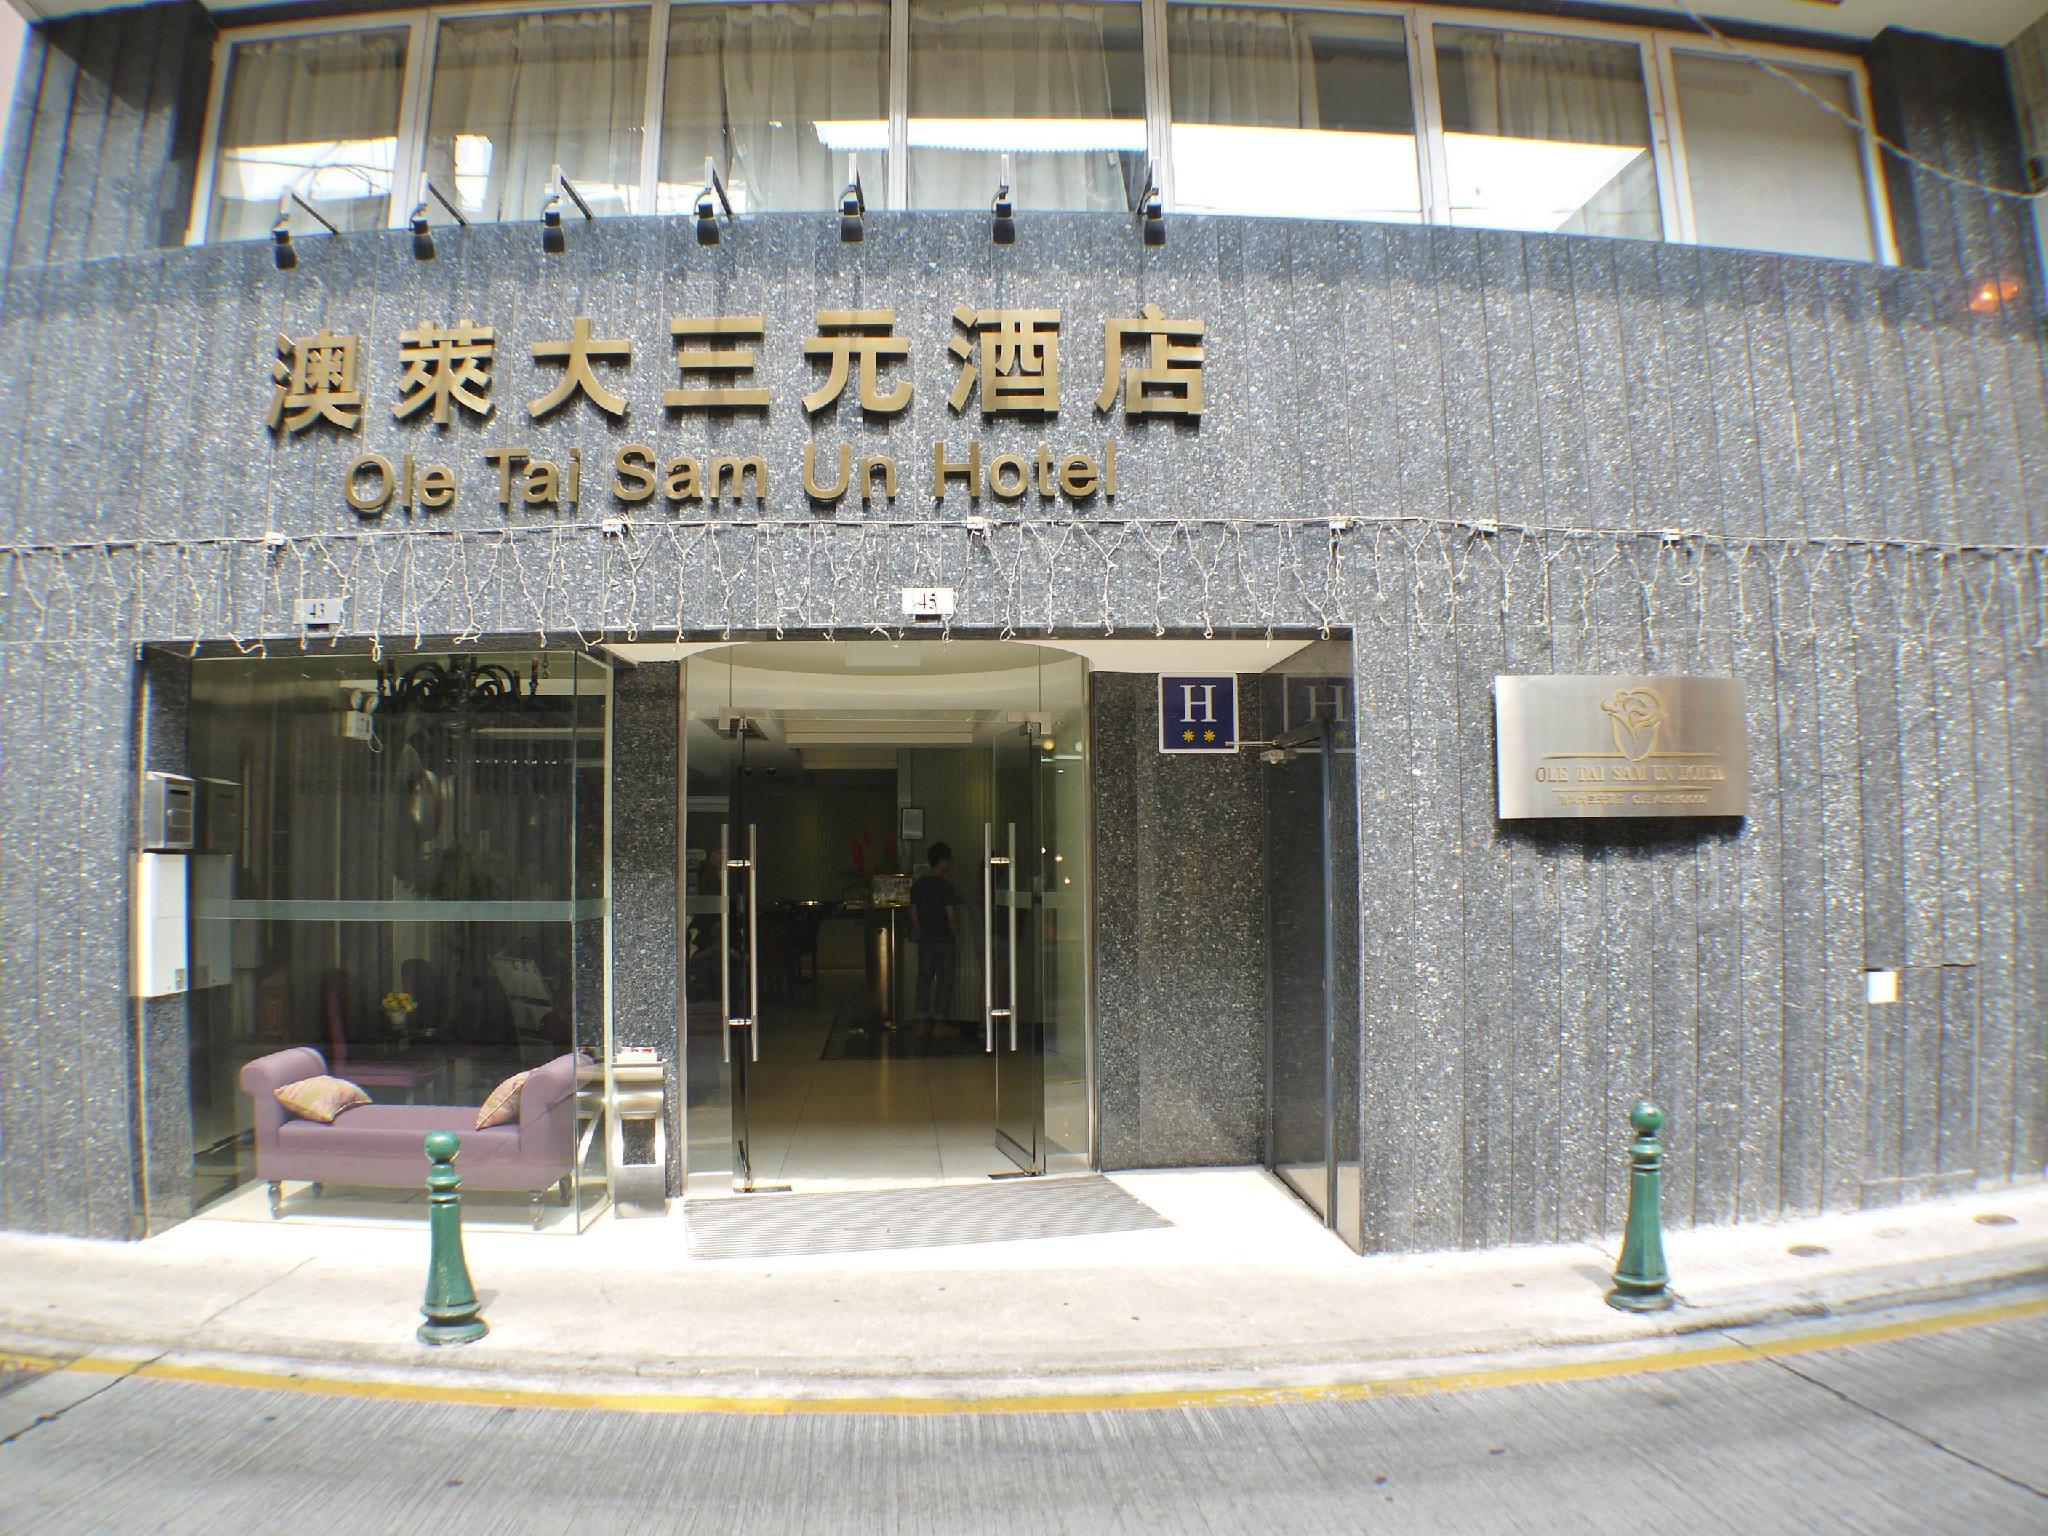 Ole Tai Sam Un Hotel Macau